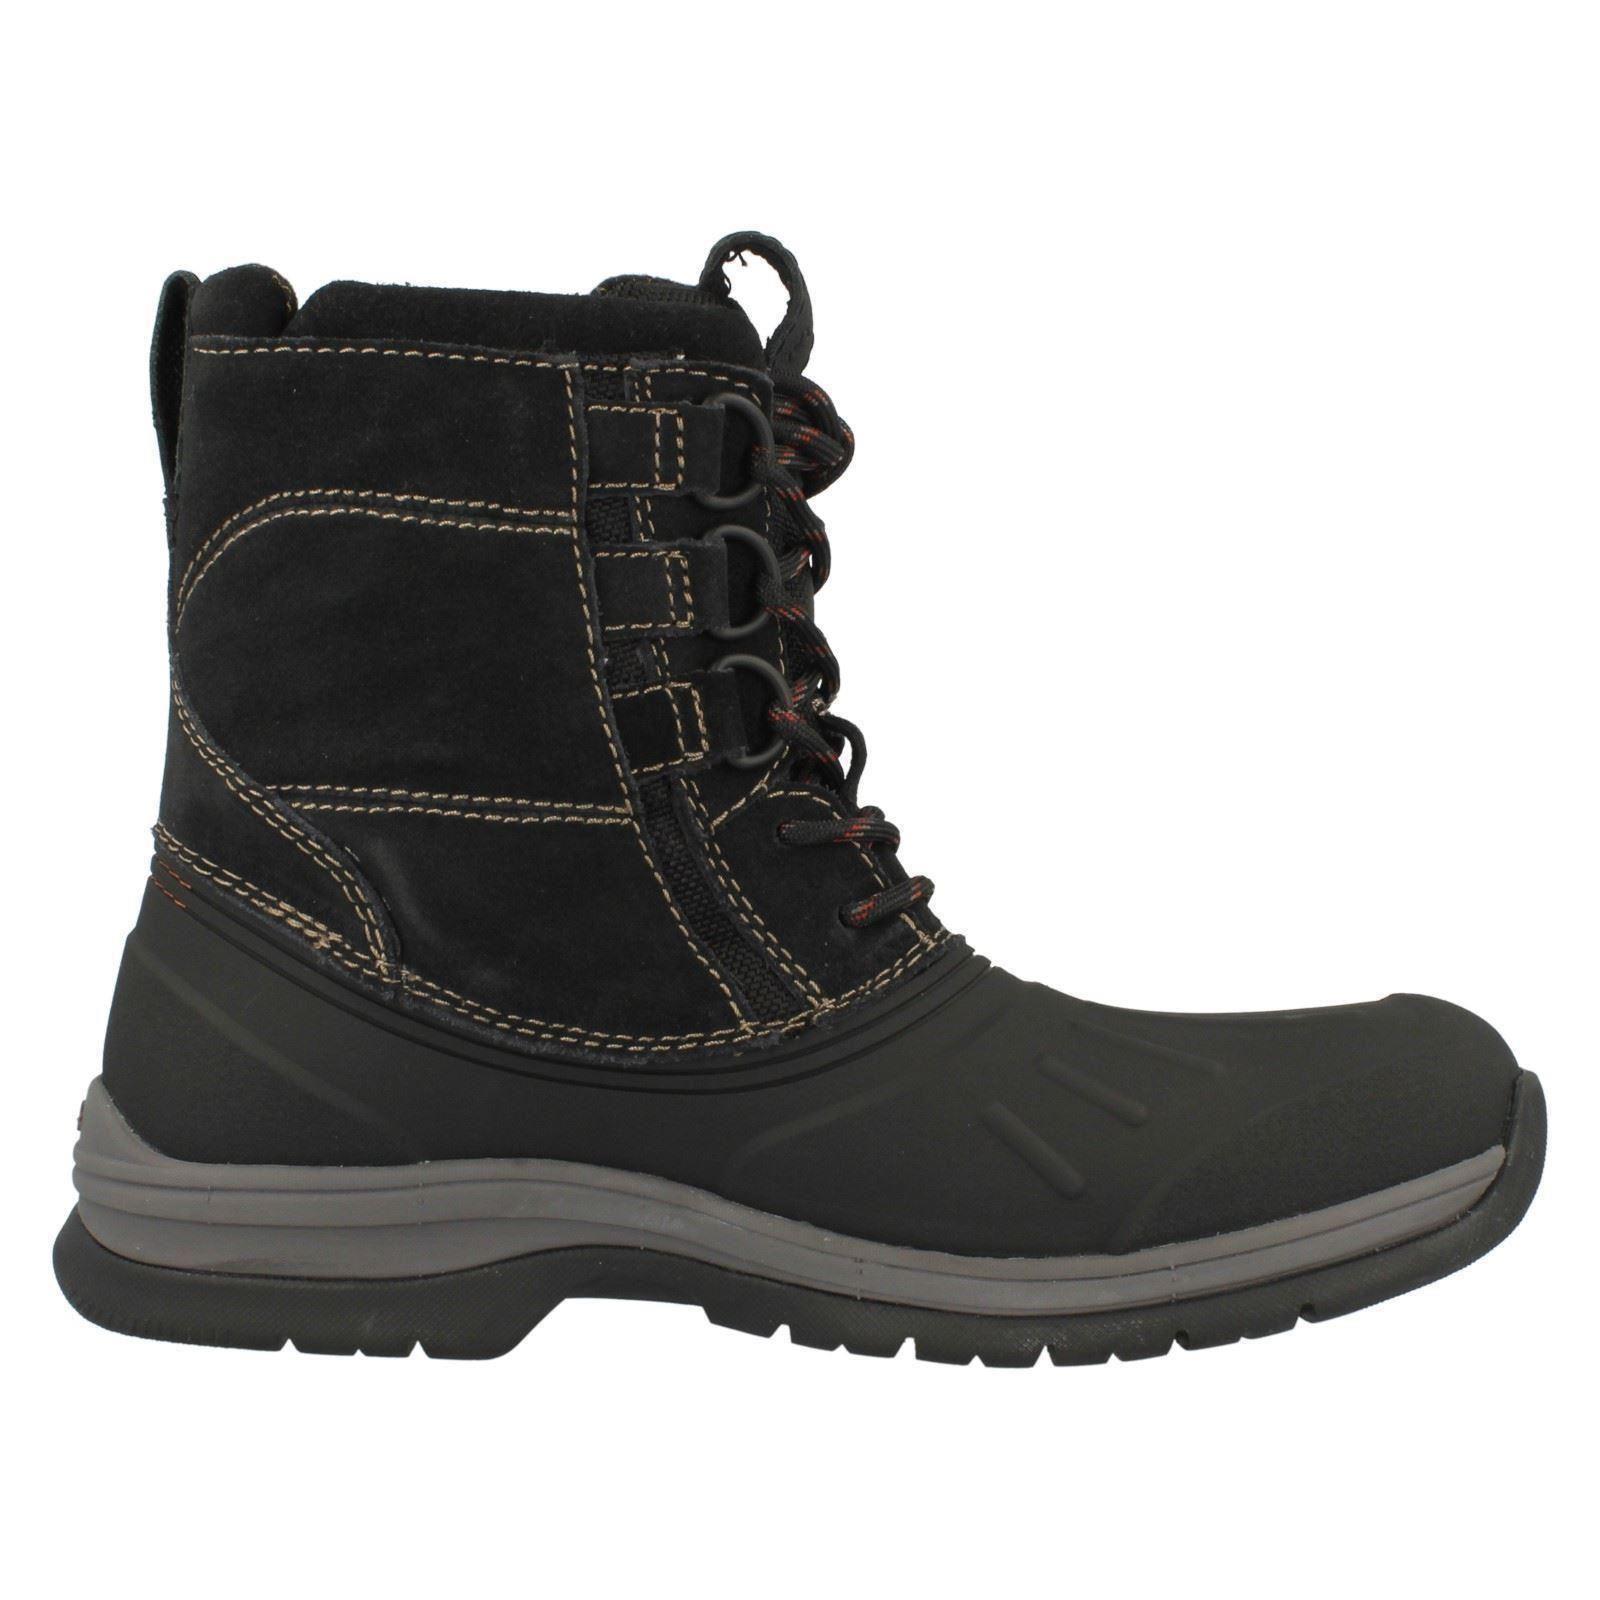 Mens-Clarks-Outdoor-Boots-Nashoba-Summit thumbnail 10